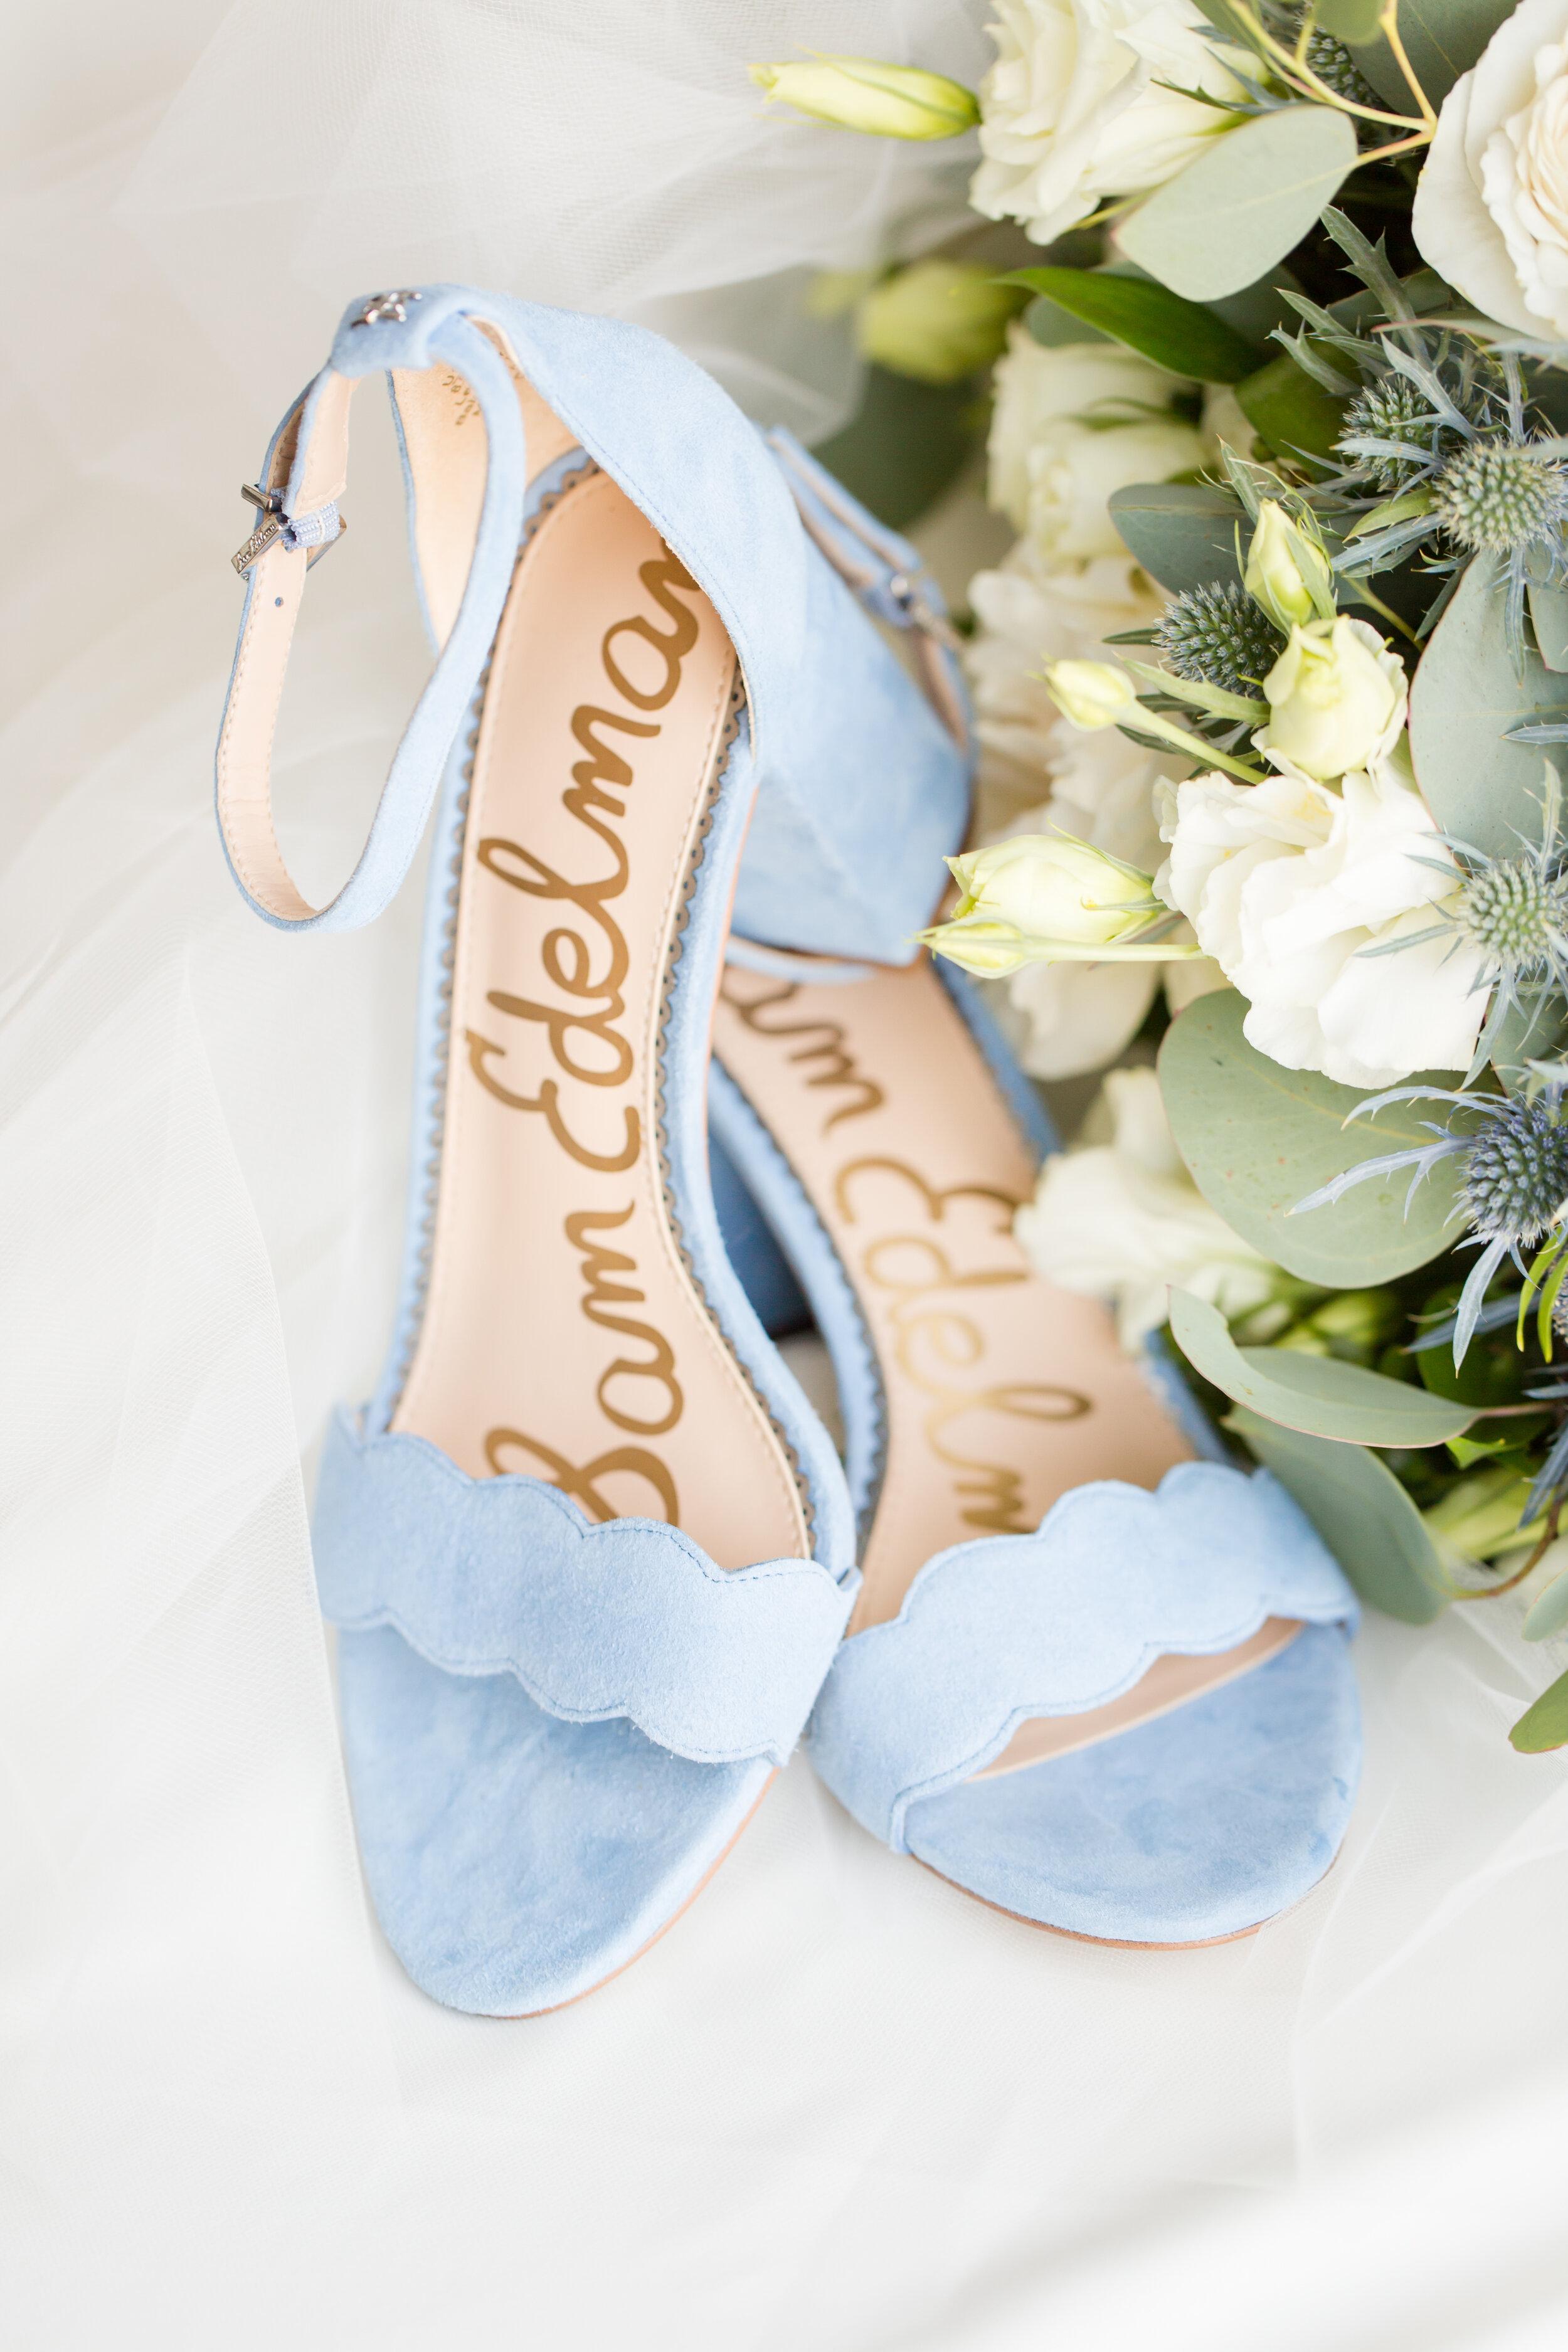 ivory-and-beau-bride-wedding-dresses-bridal-boutique-bridal-shop-savannah-wedding-shop-ivory-and-beau-bride-wedding-dresses-bridal-boutique-bridal-shop-savannah-wedding-shop-DGP_SohoSouthCafe_Swanagin-Mullis-7.JPG